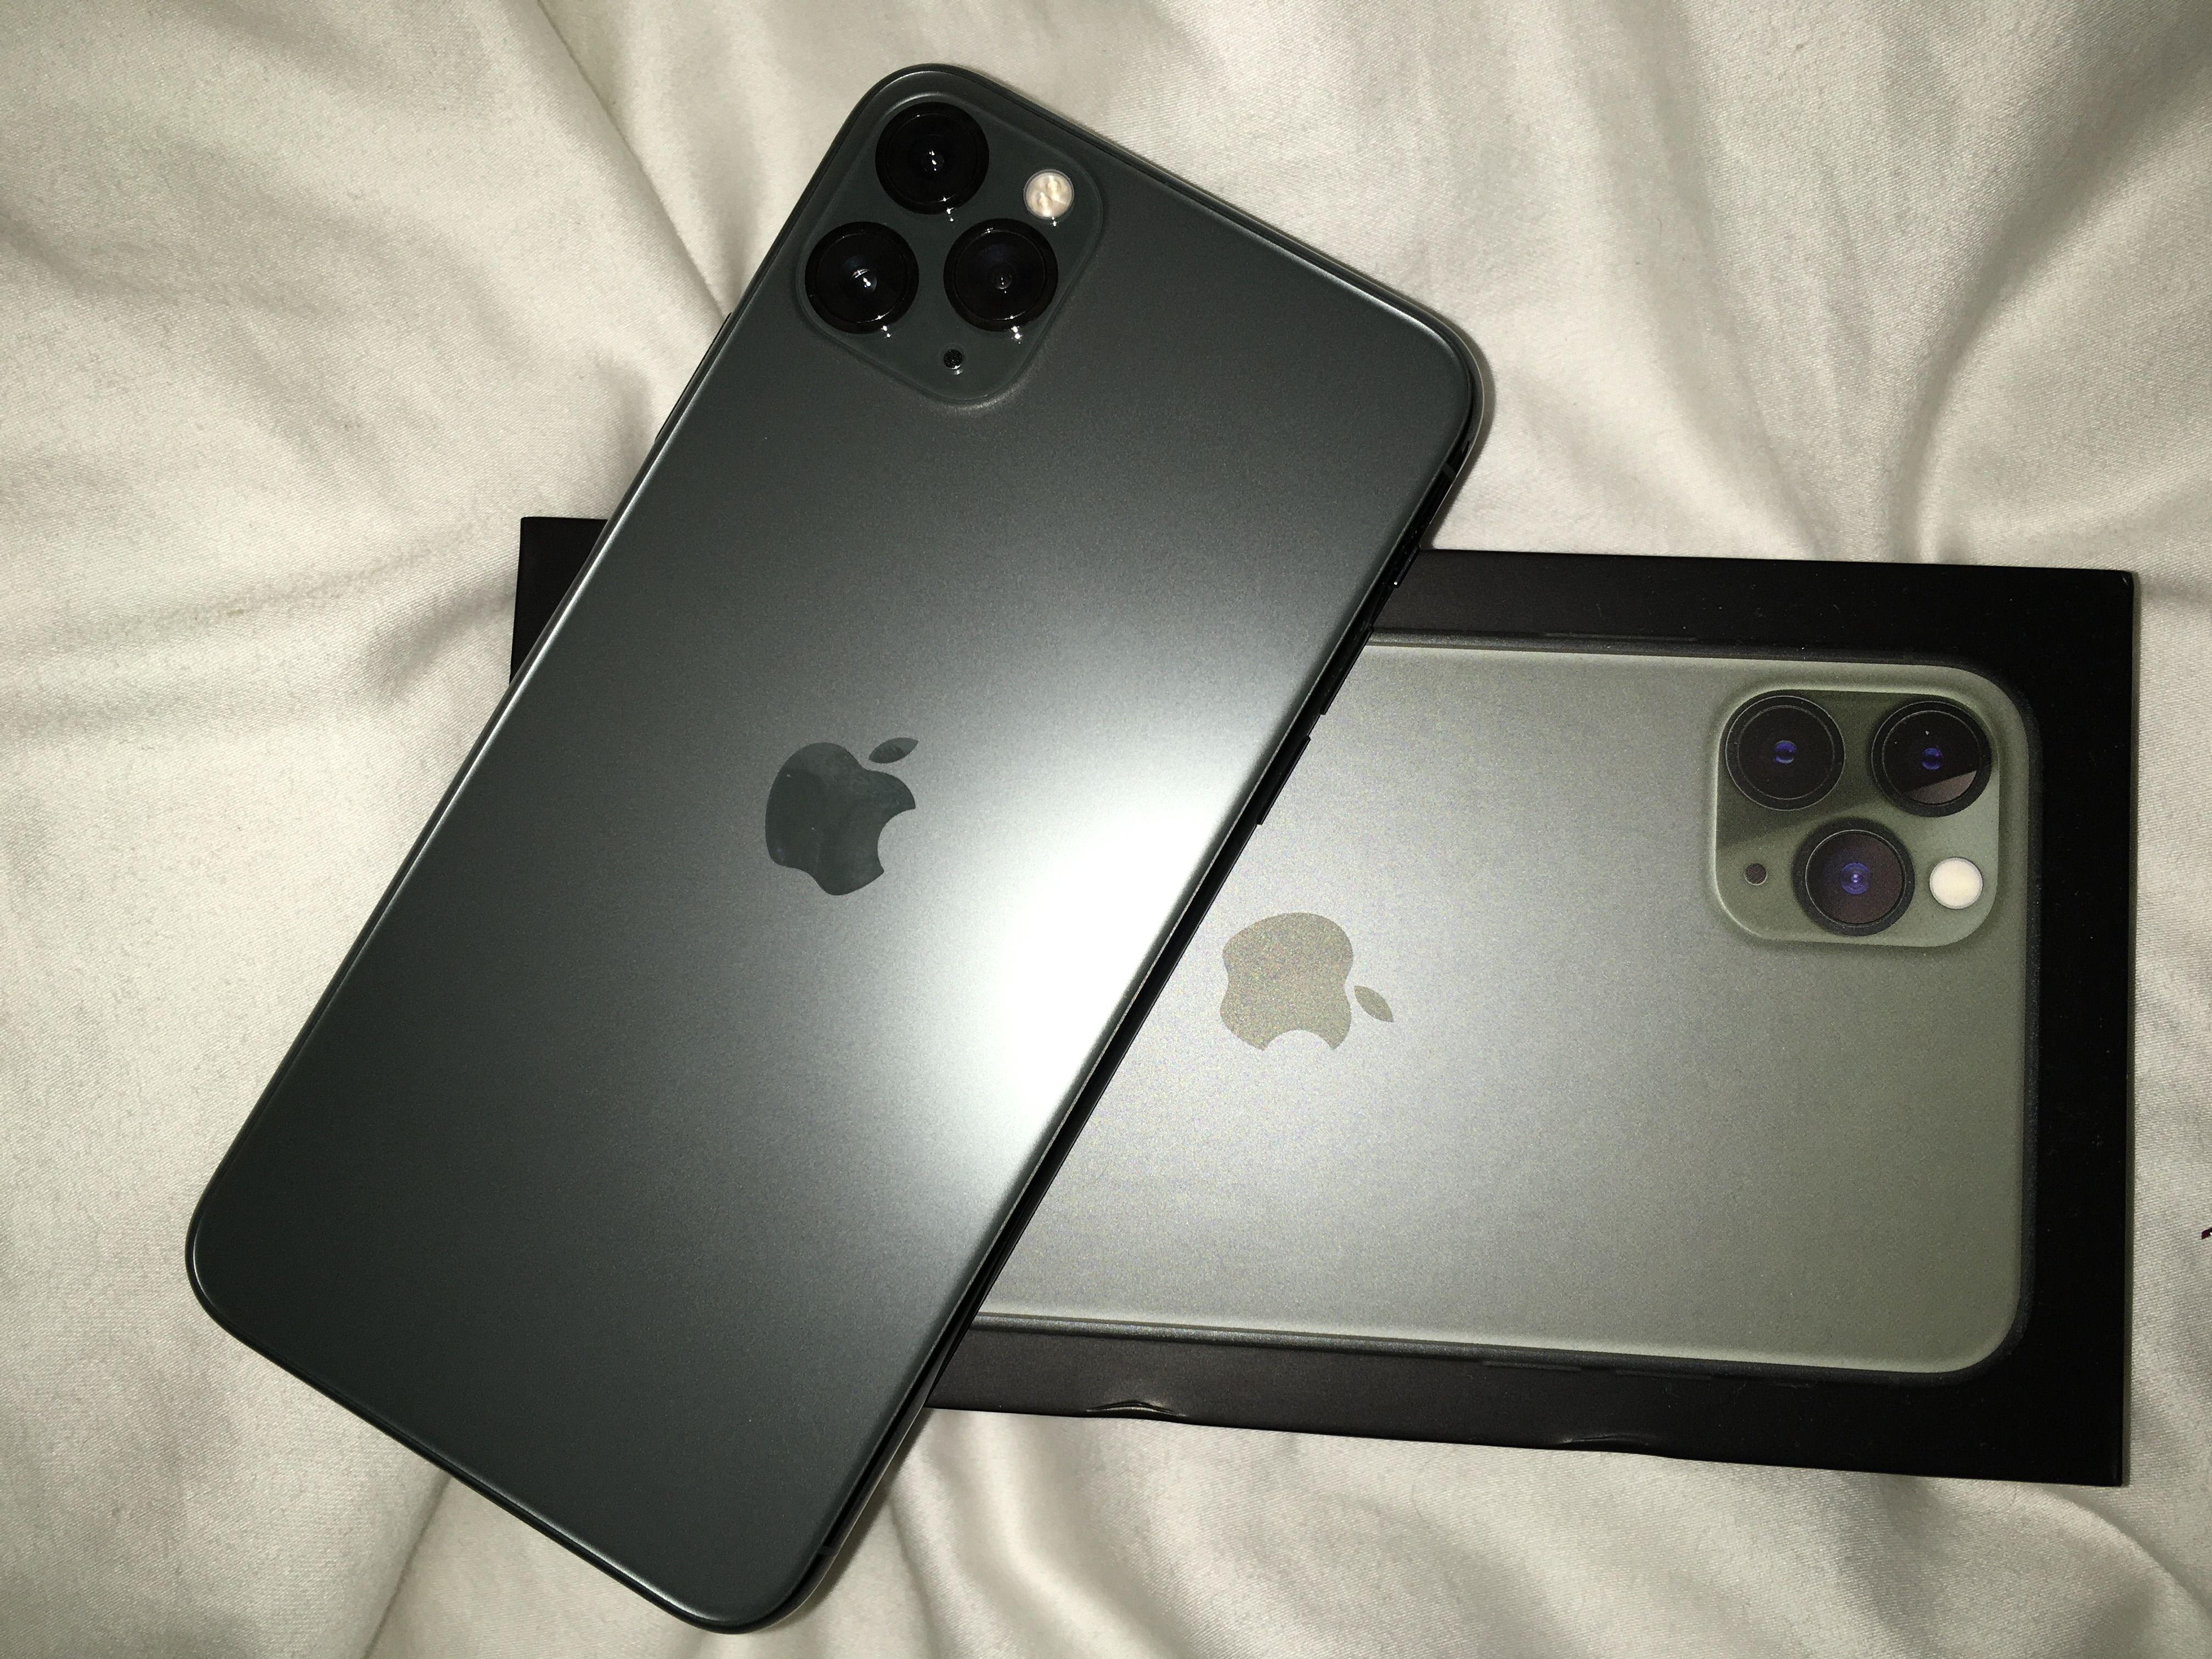 iPhone myiphone ilovethecolor brandloyal